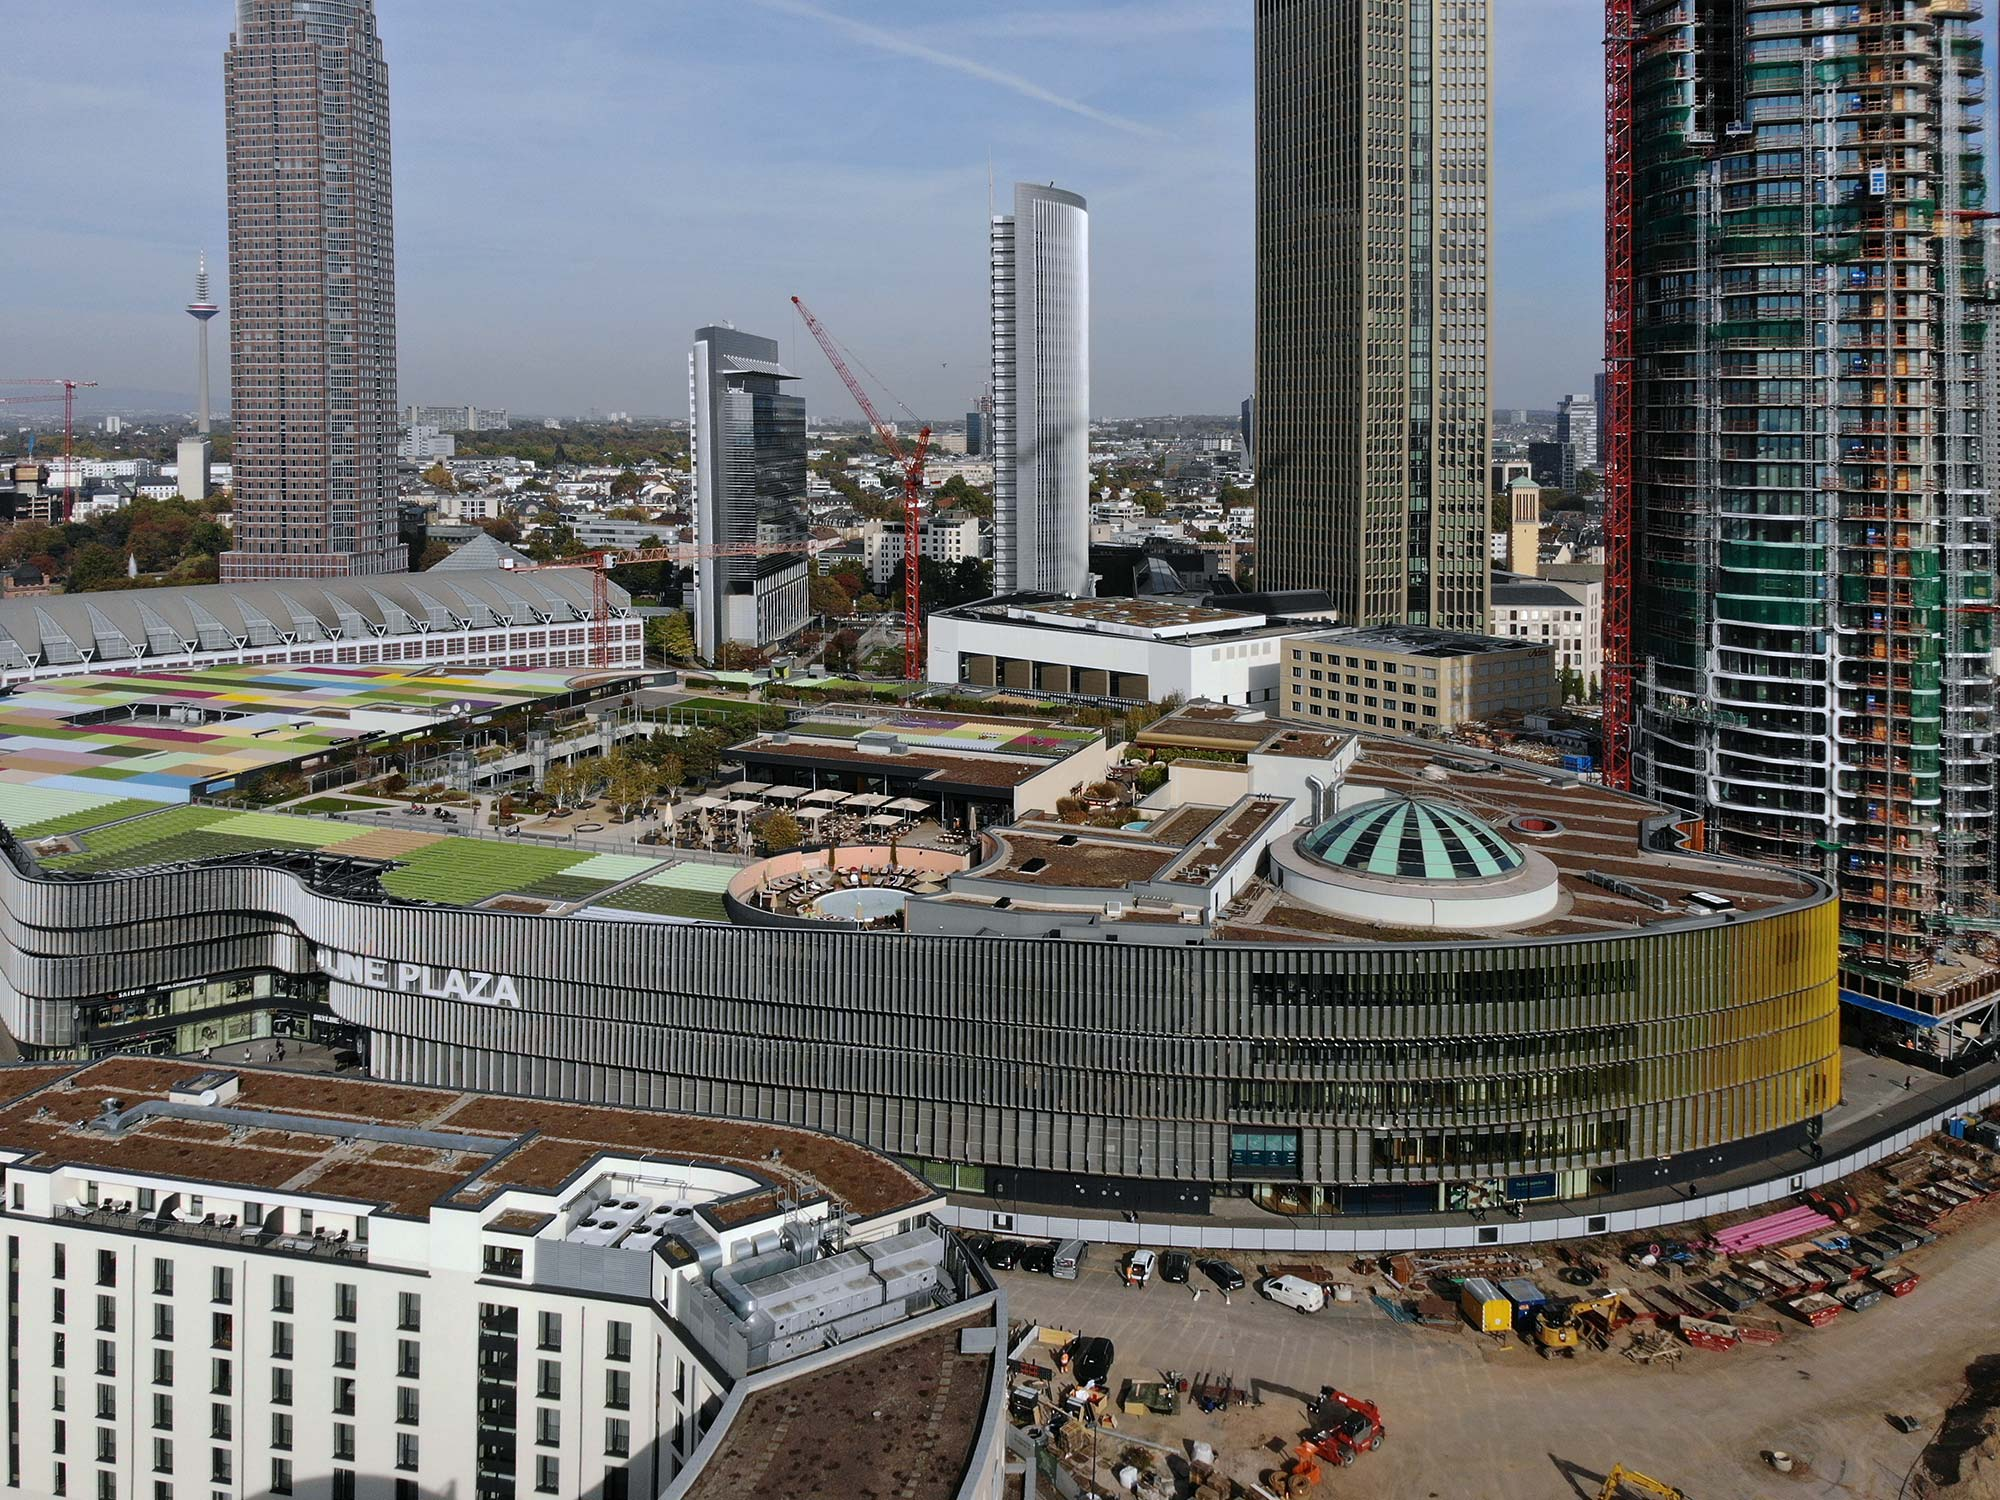 Skyline Plaza FFM - Shopping Center Frankfurt - Luftaufnahme